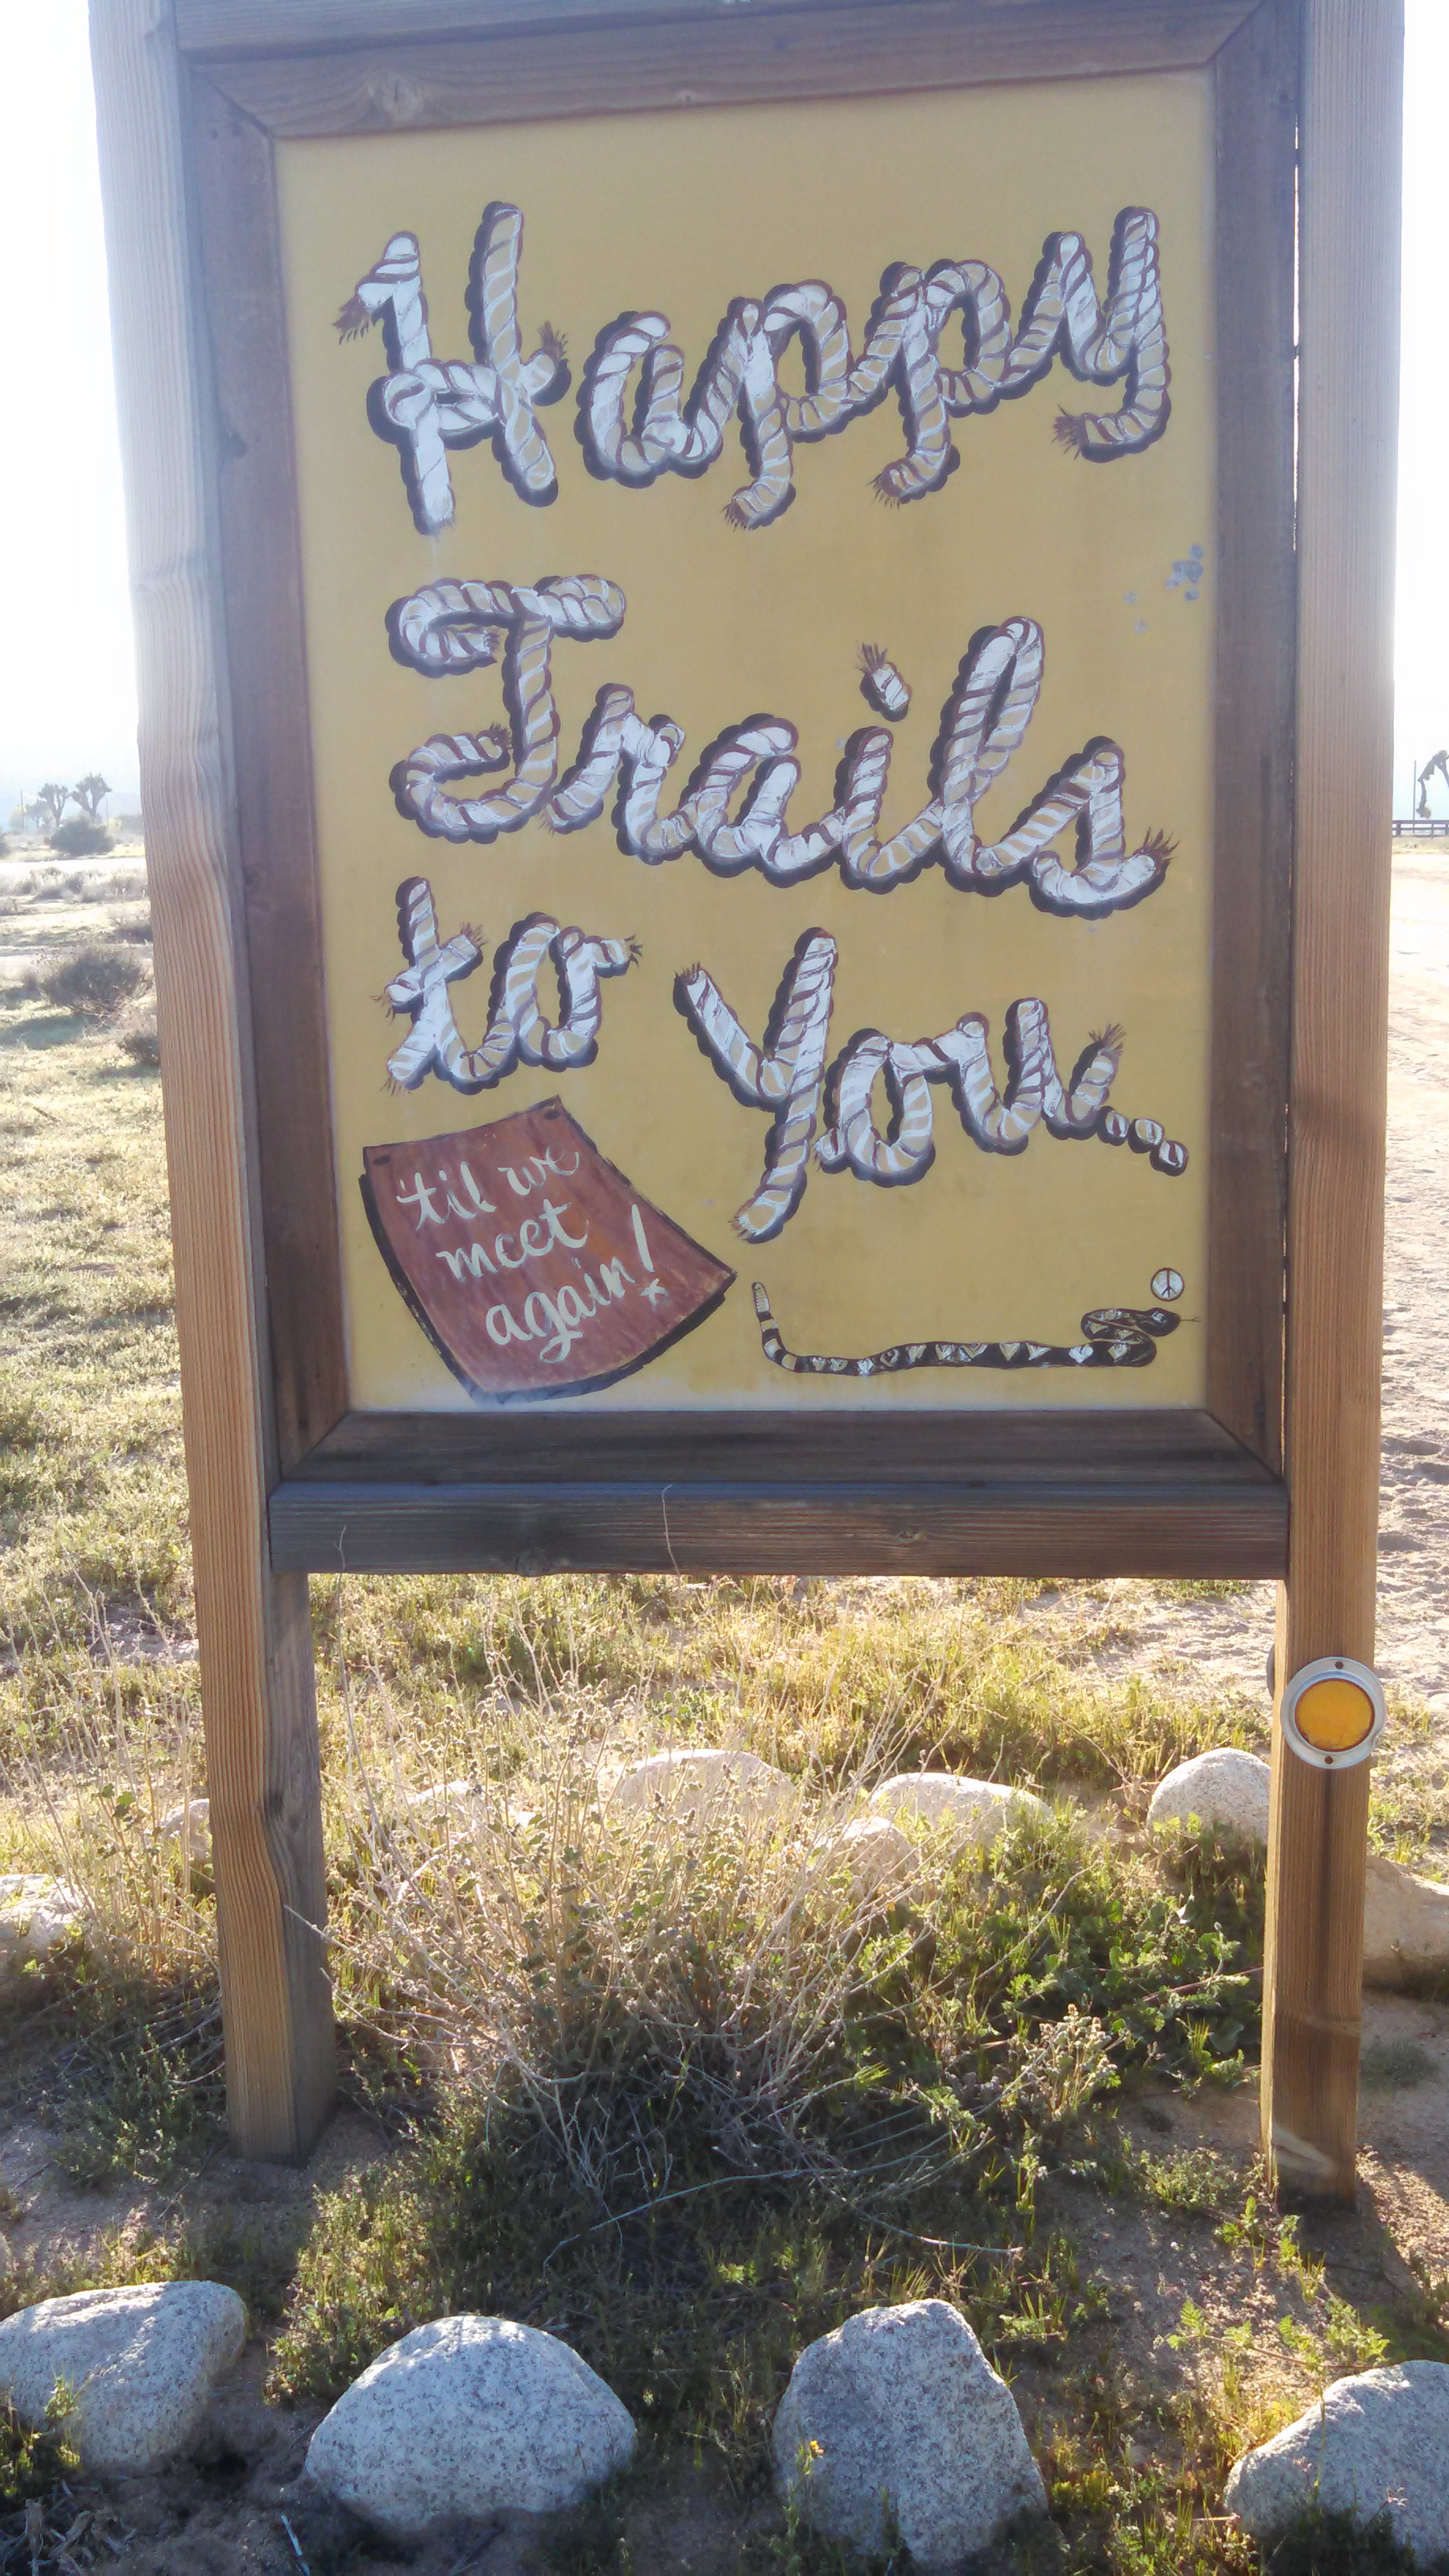 wpid wp 1427040440412 - LFTR - US - CA - Roadside oddities make me happy. Giant Rock, Integratron, Pioneer town